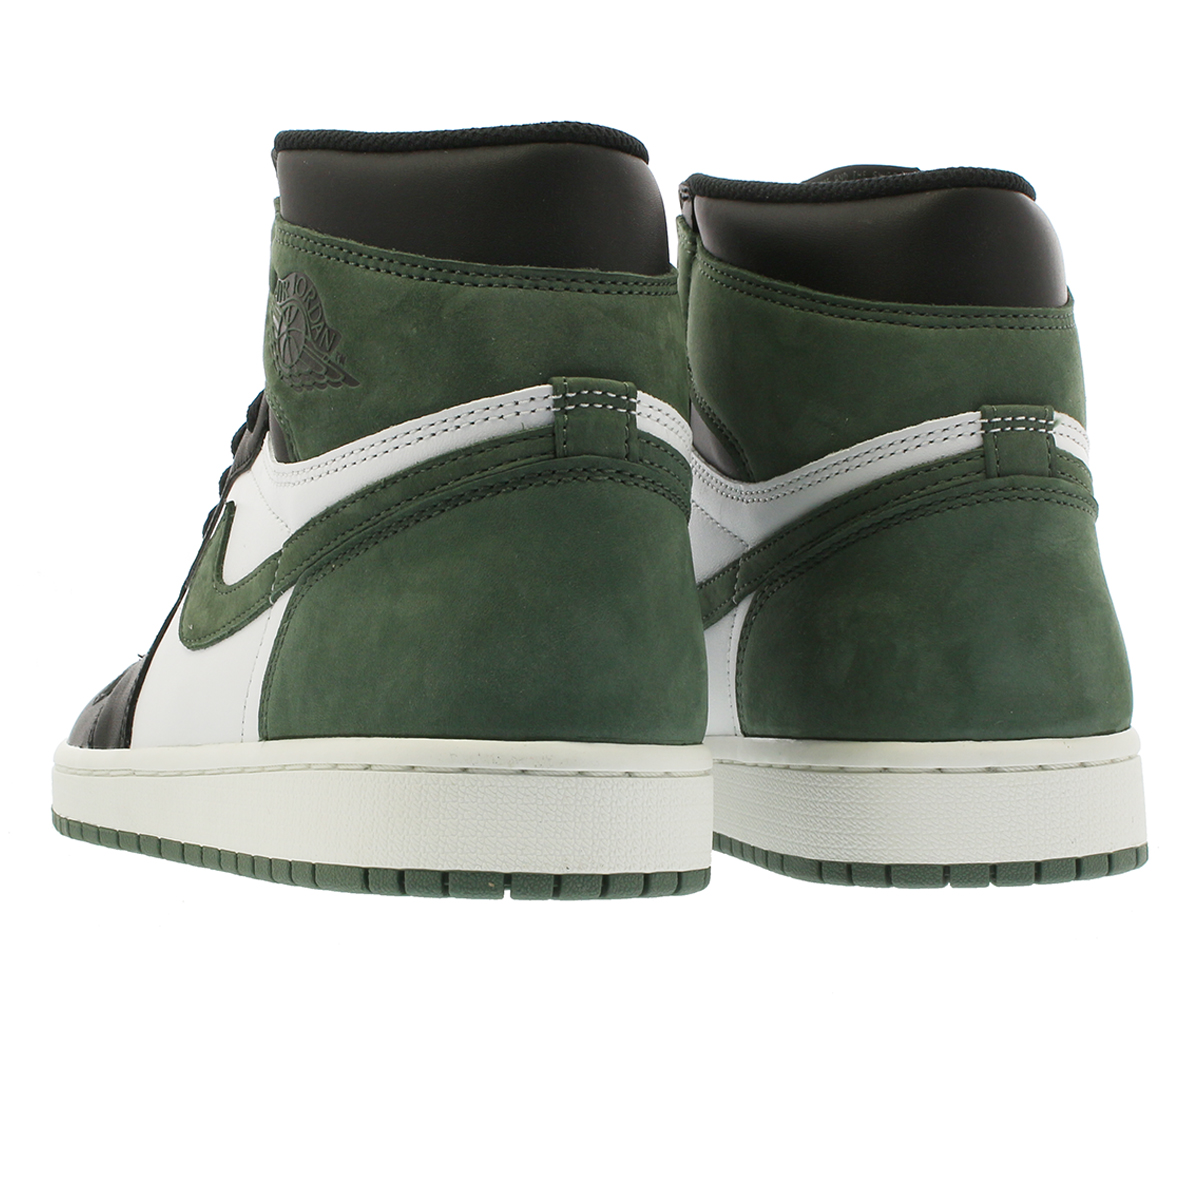 NIKE AIR JORDAN 1 RETRO HIGH OG Nike Air Jordan 1 nostalgic high OG WHITE  BLACK CLAY GREEN 934161c9c